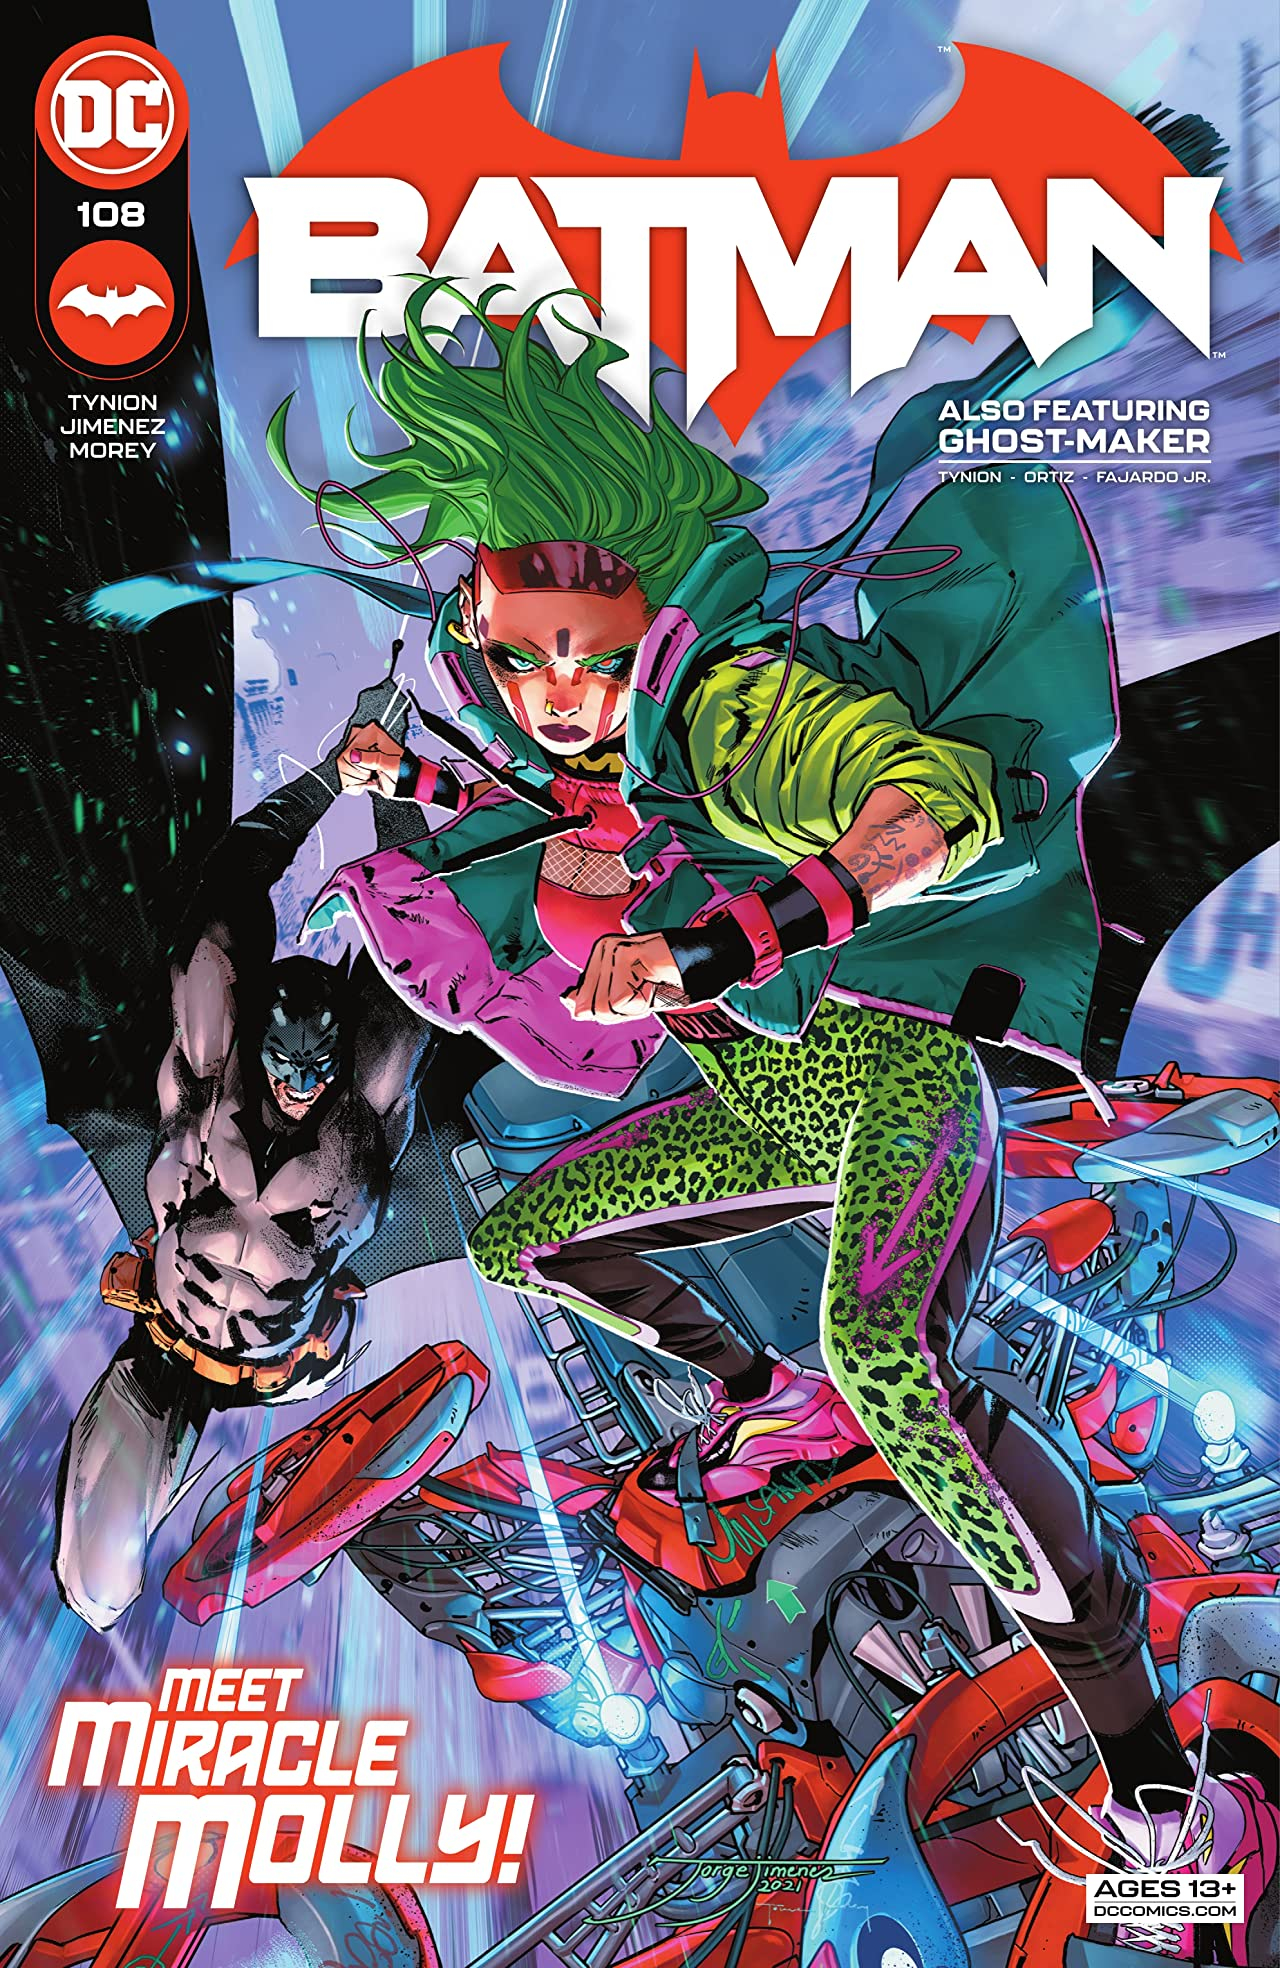 Batman (2016-) #108